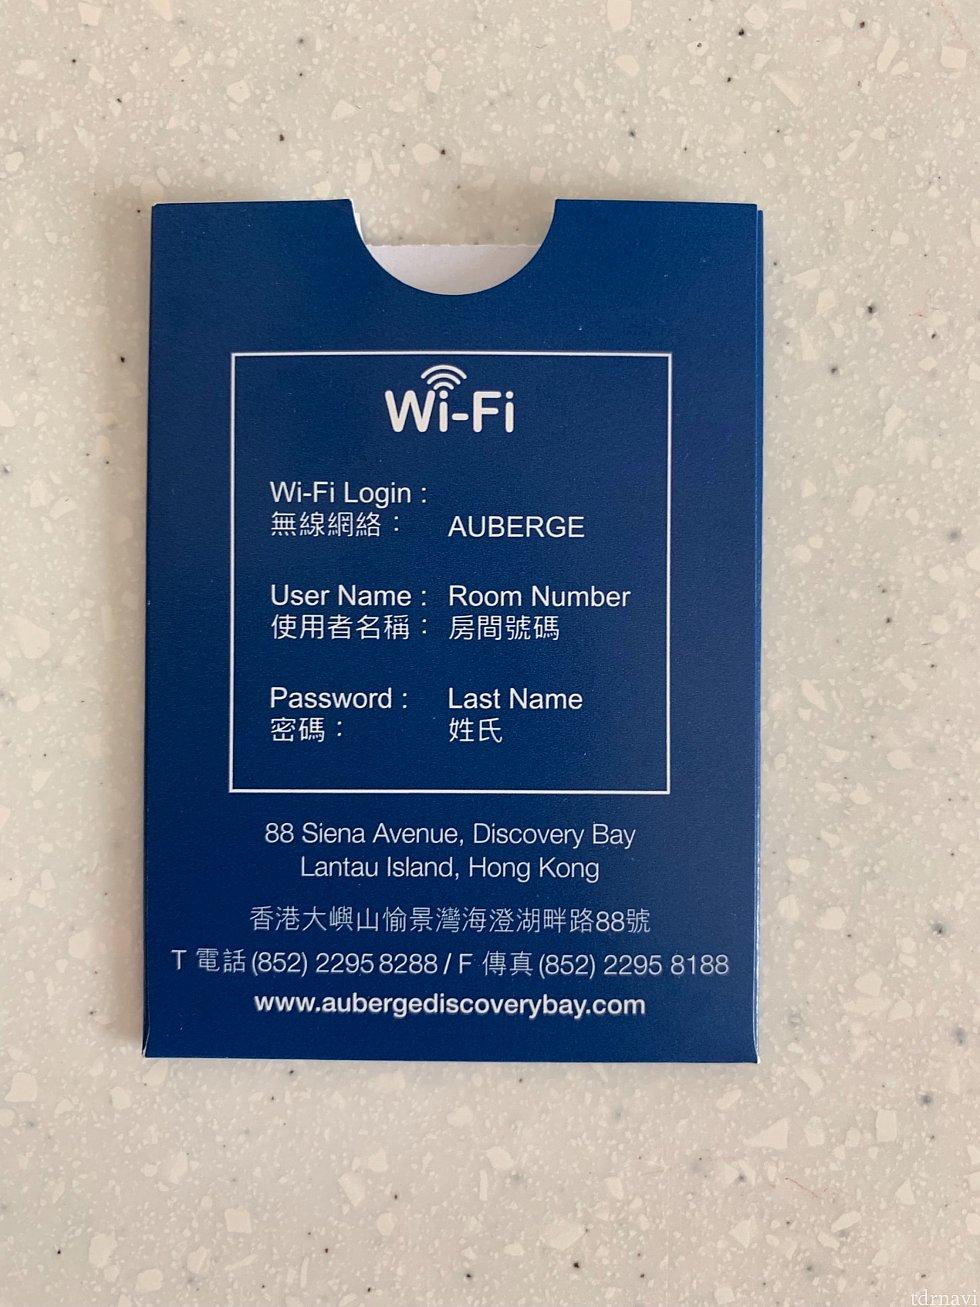 Wi-Fiも宿泊中は利用できます。 部屋番号と苗字の入力が必要となります。 速度はそこそこかな・・・